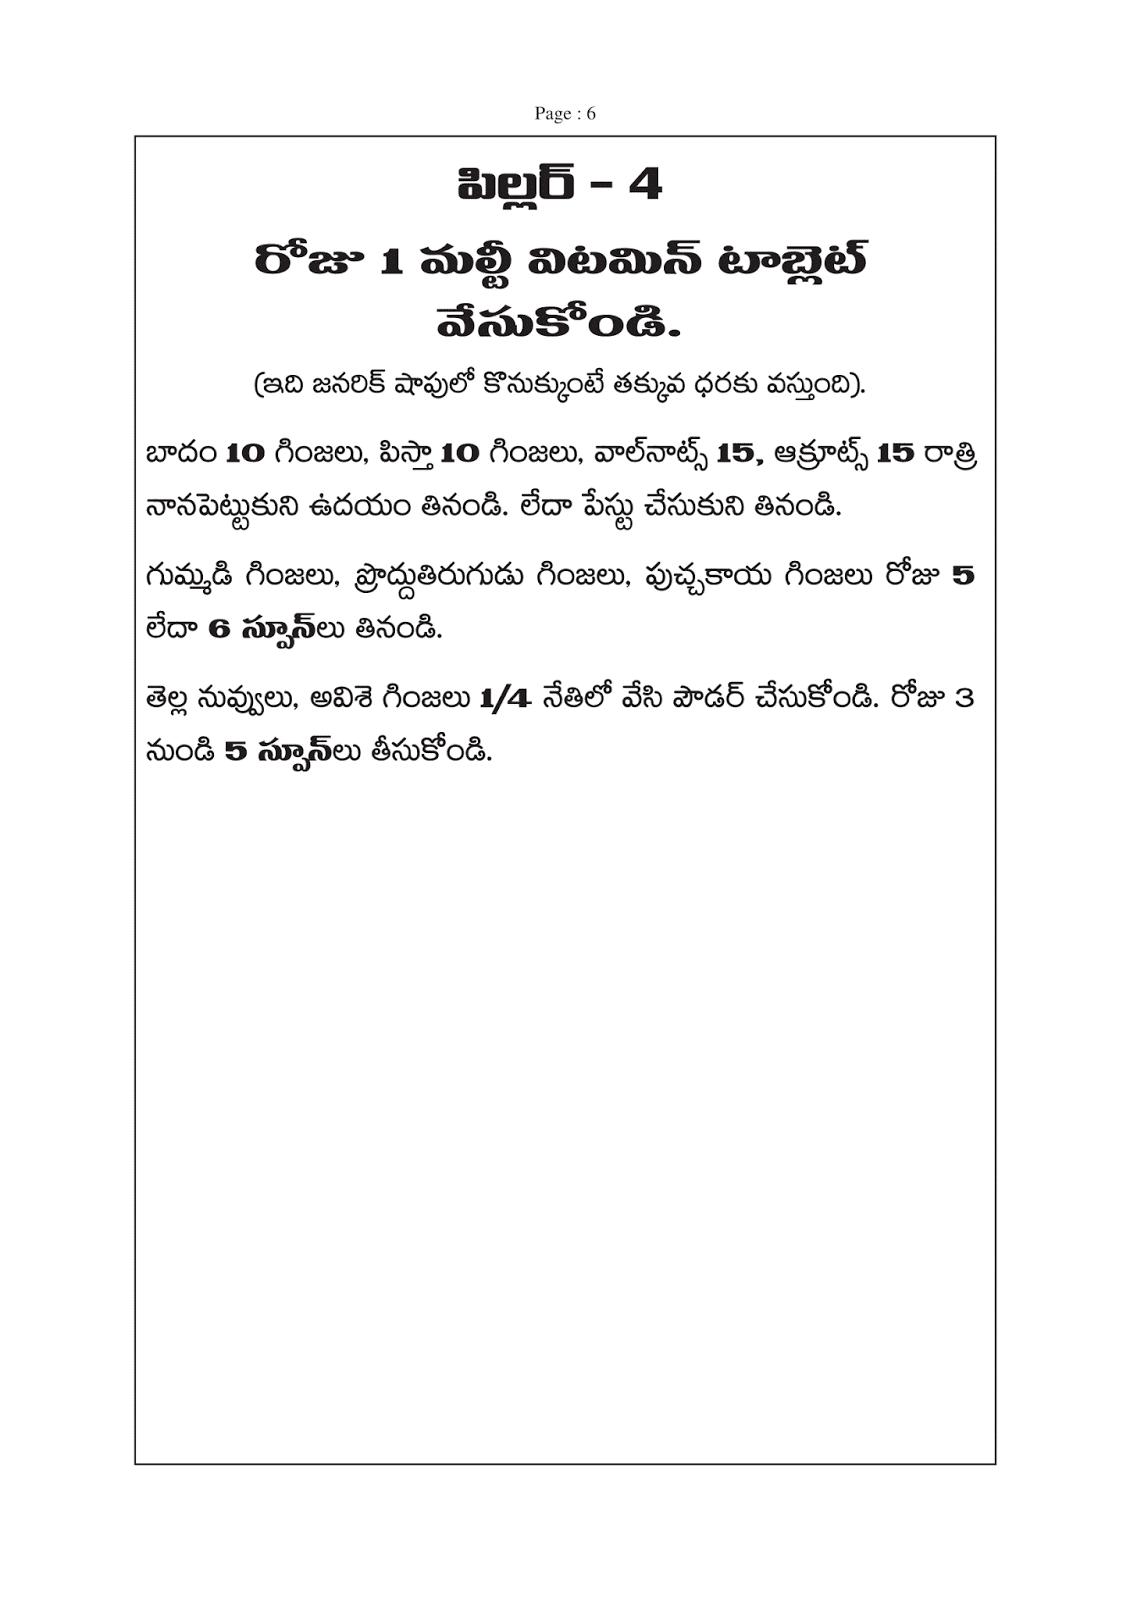 Veeramachaneni Ramakrishna Diet Program Pillar 4 In Telugu